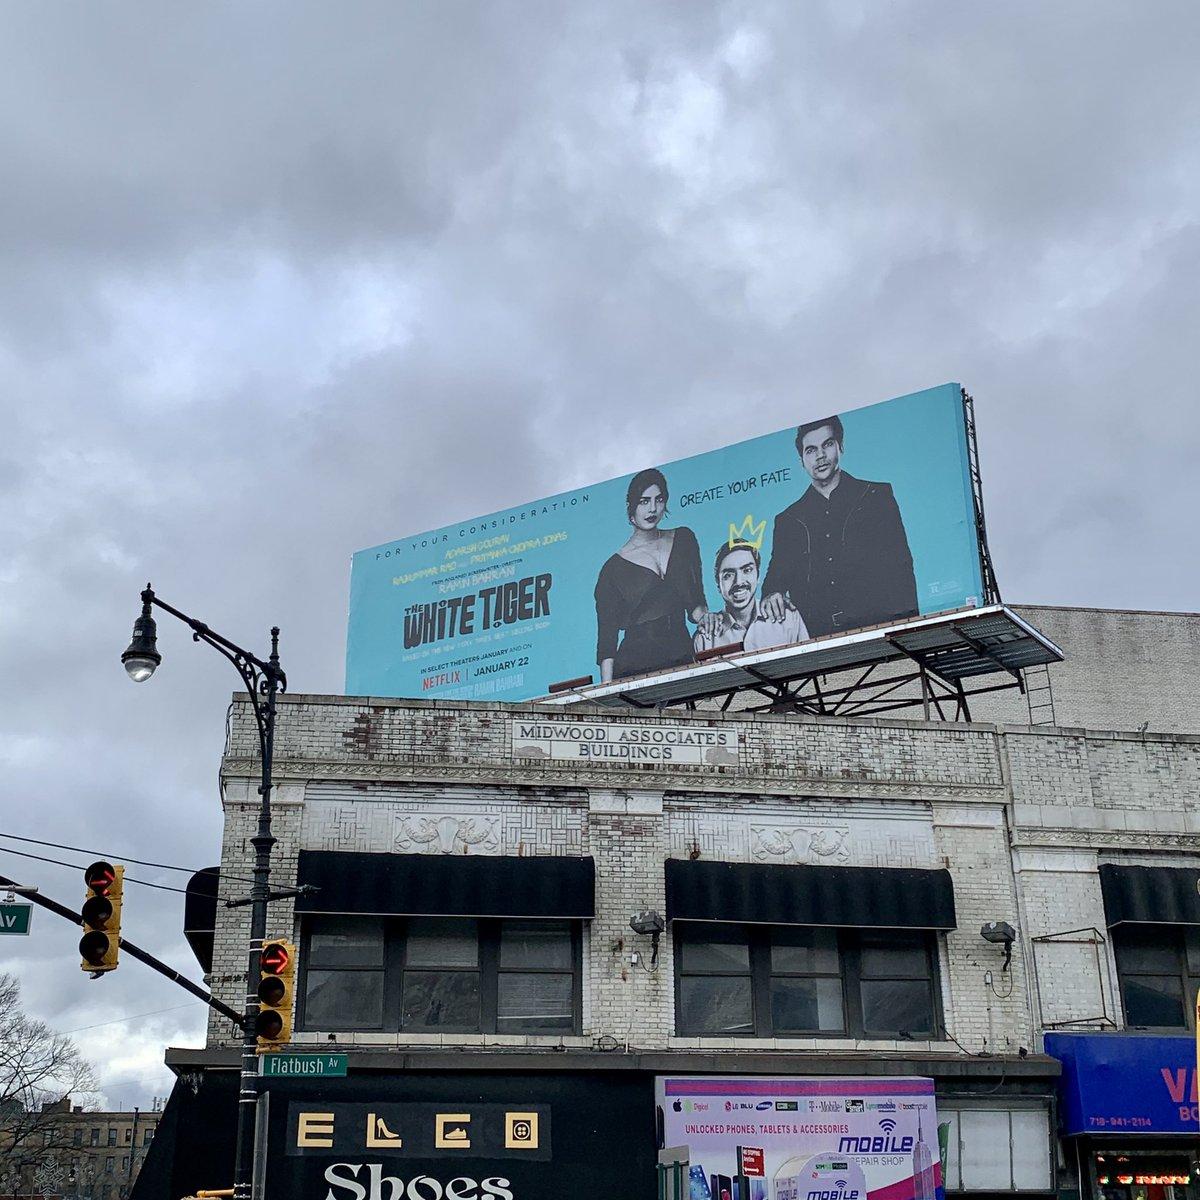 Found in #Brooklyn. Representation matters @netflix @NetflixIndia @priyankachopra @RajkummarRao @_GouravAdarsh